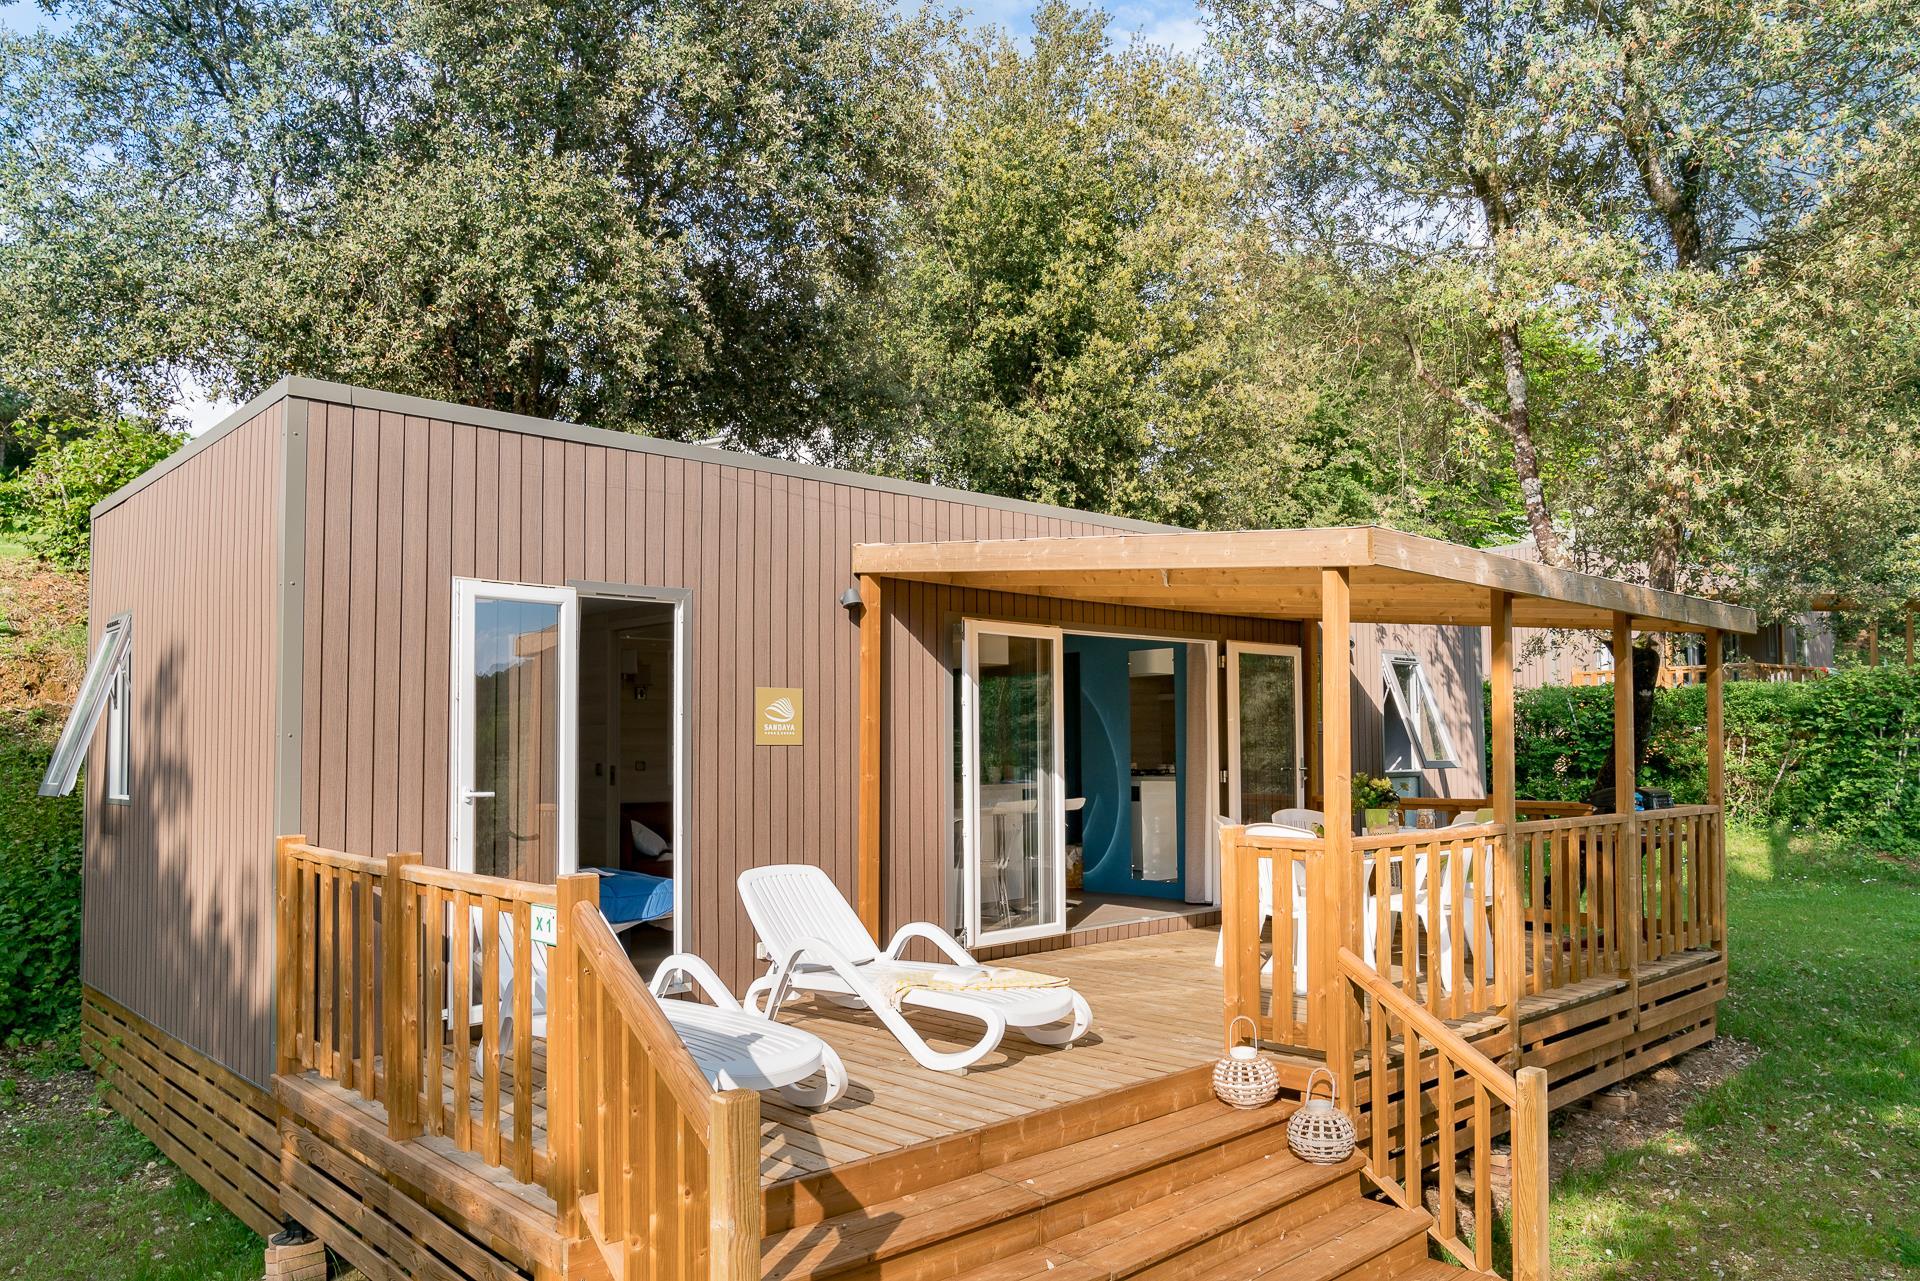 Location - Cottage Perigord 3 Chambres Clim Premium - Camping Sandaya Les Péneyrals